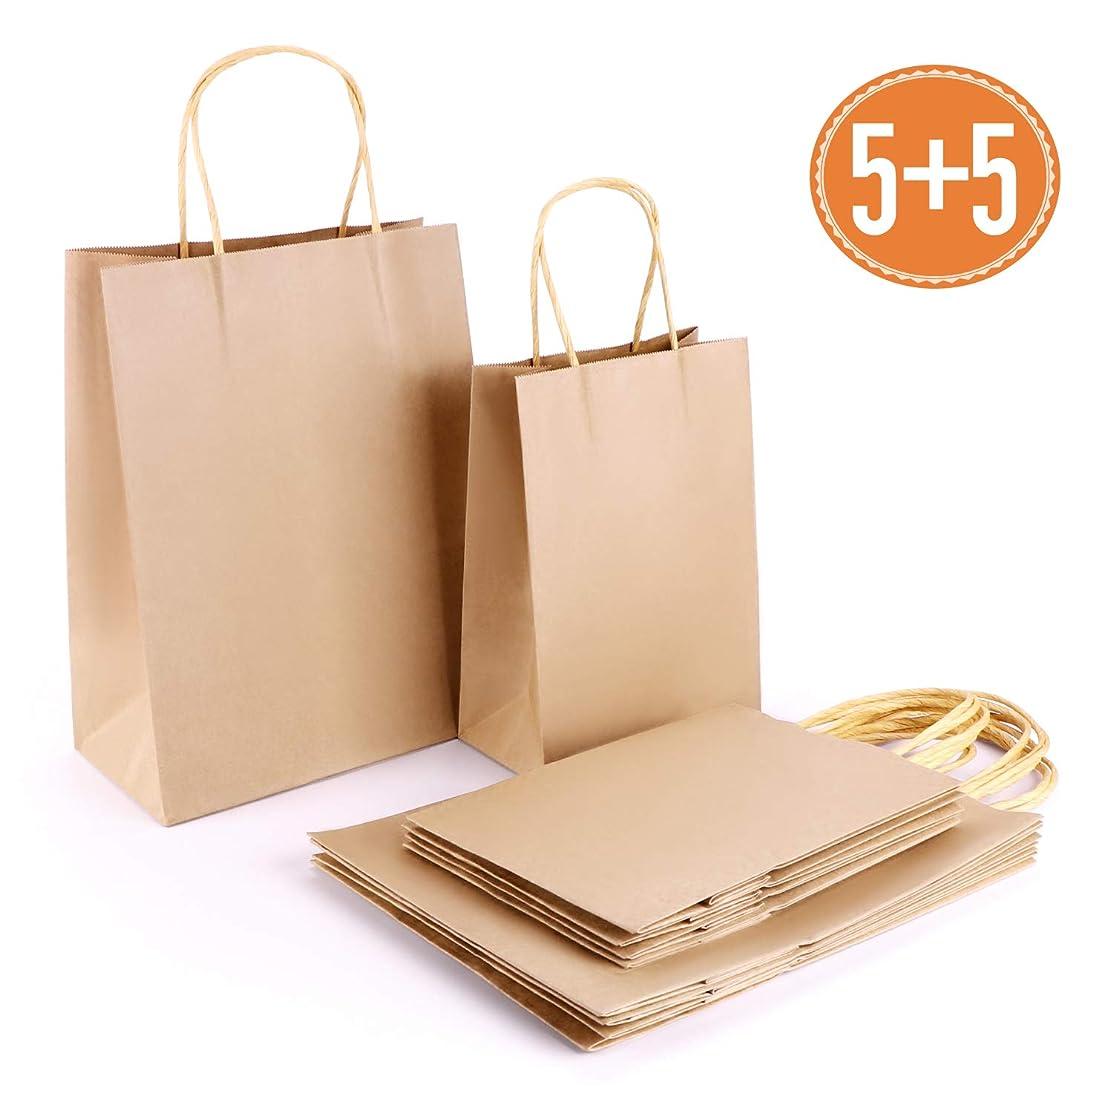 Brown Kraft Paper Bags Small Craft Gift Bags 5 pcs in 5.25